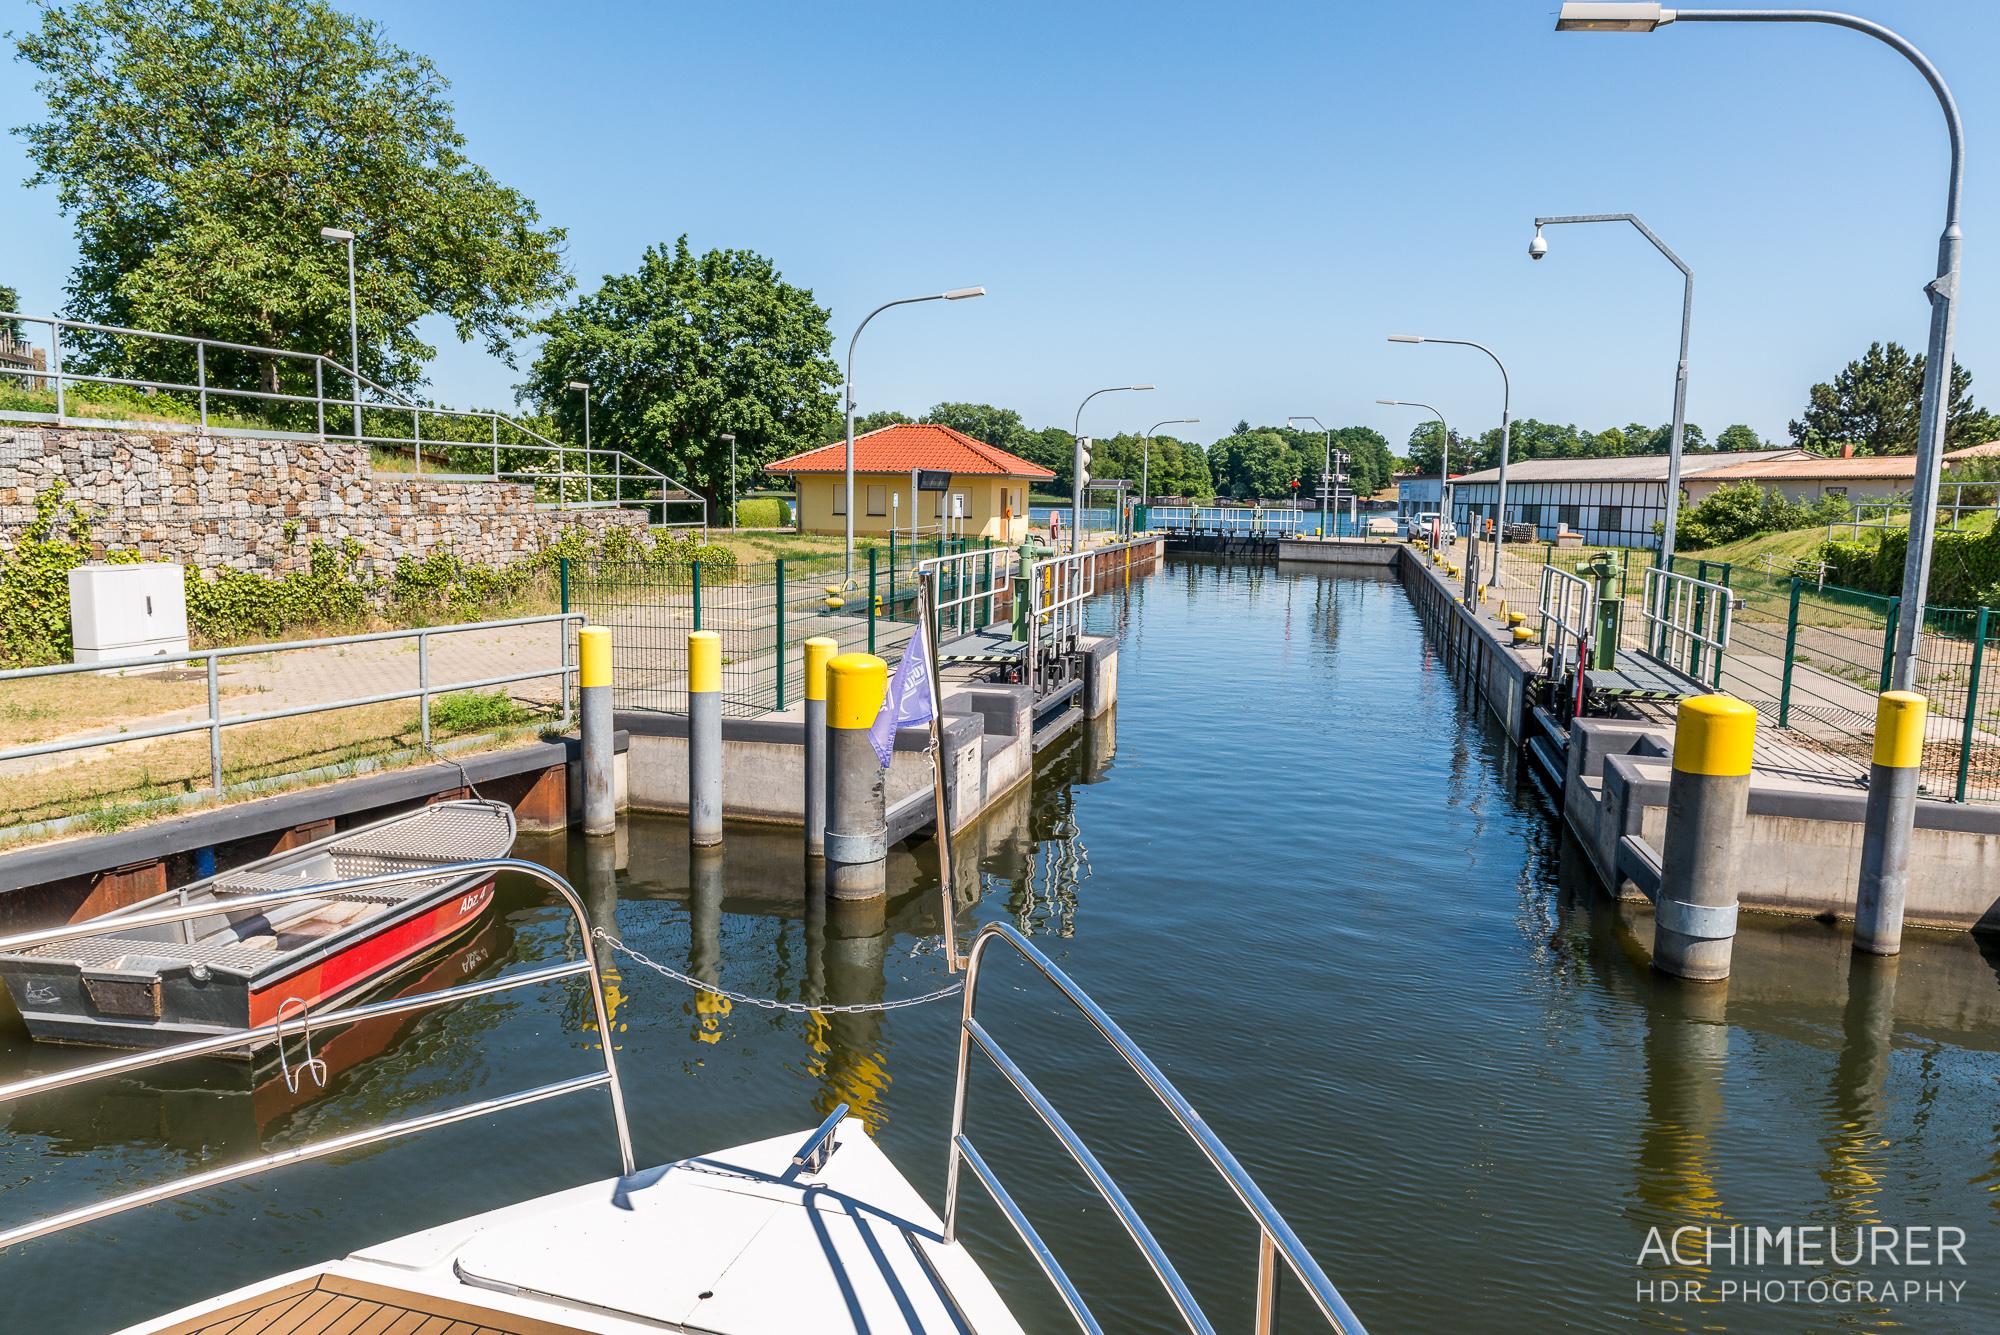 Hausboot-Kuhnle-Mueritz-Mecklenburg-Vorpommern-See_3188